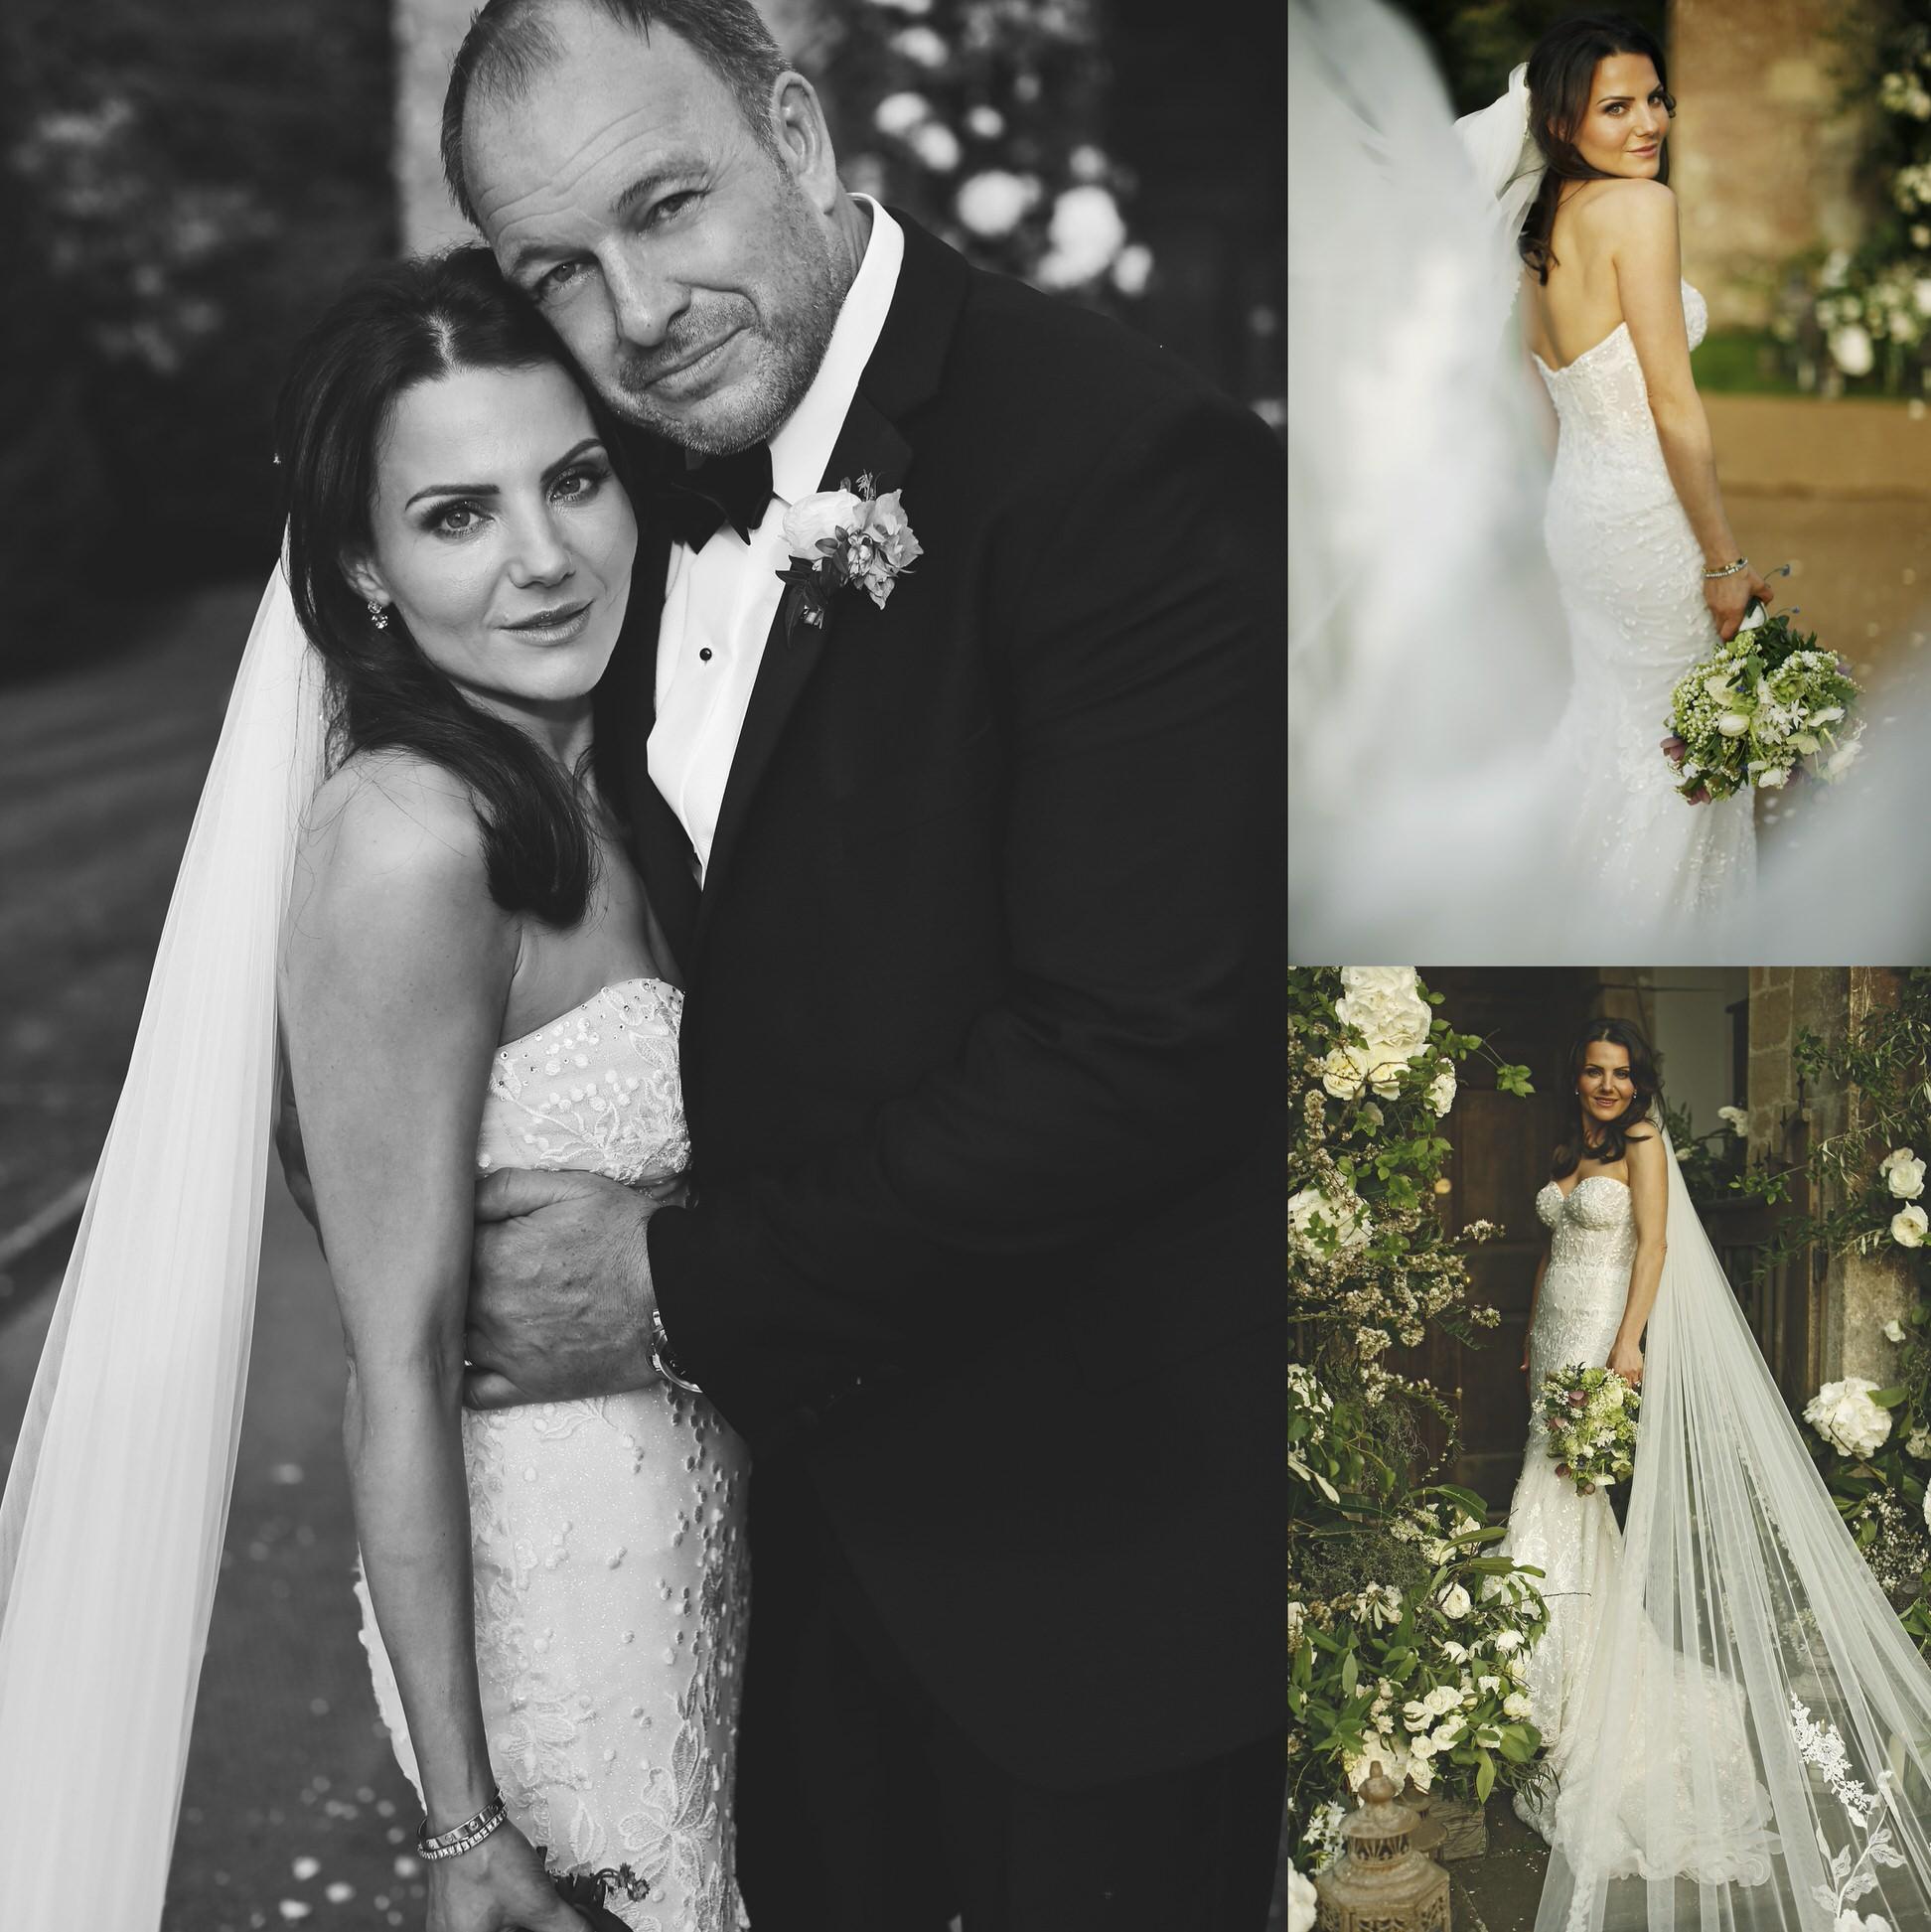 brettharkness-luxury-wedding-photographer-uk_0043.jpg